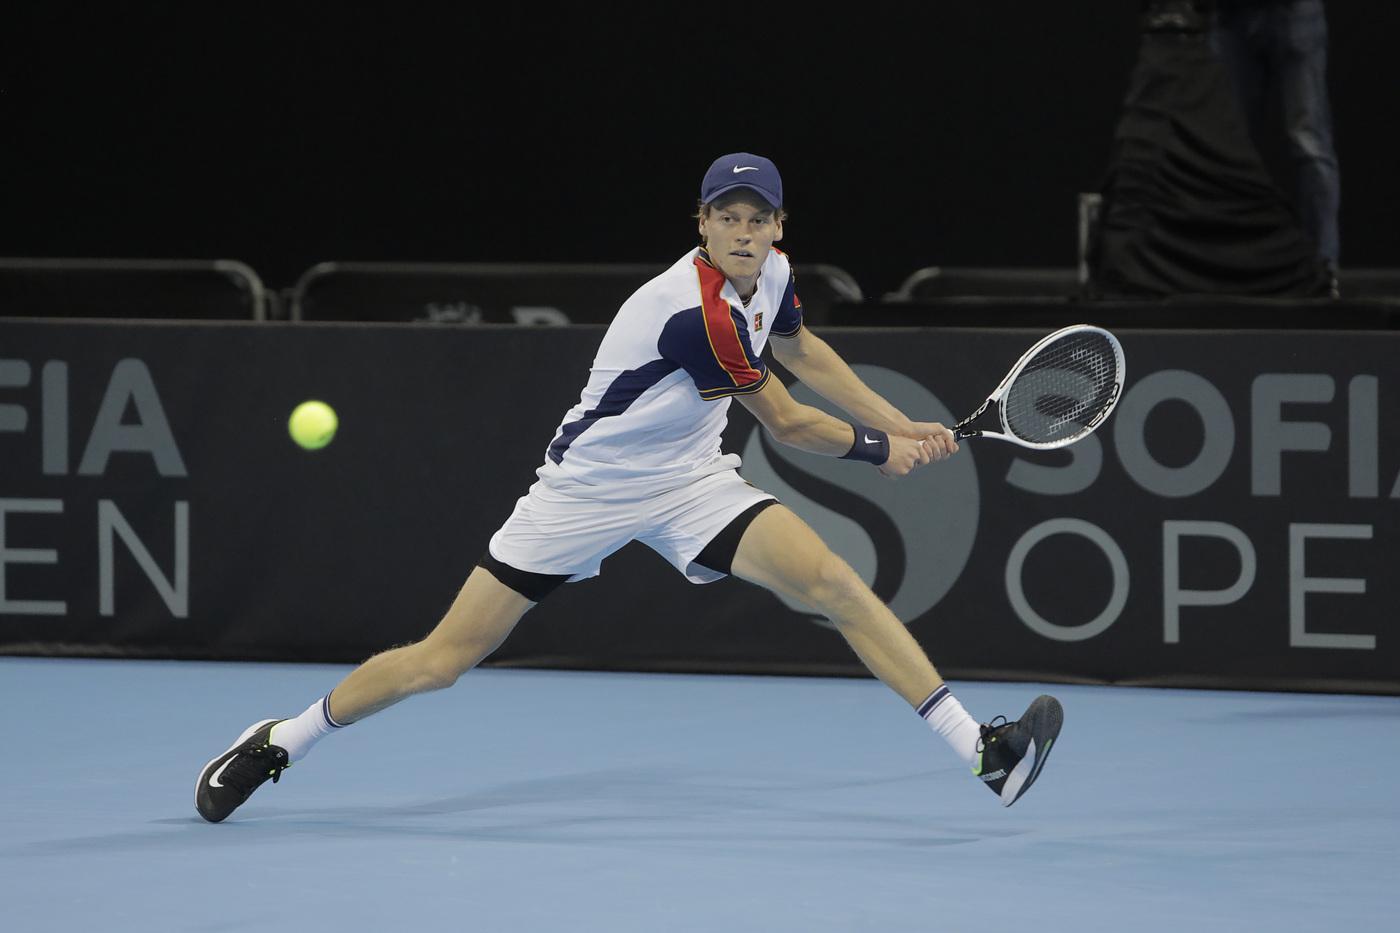 Classifica ATP Race, Jannik Sinner si avvicina a Hurkacz! Ancora due vittorie per superarlo a Vienna: è volata per le Finals!